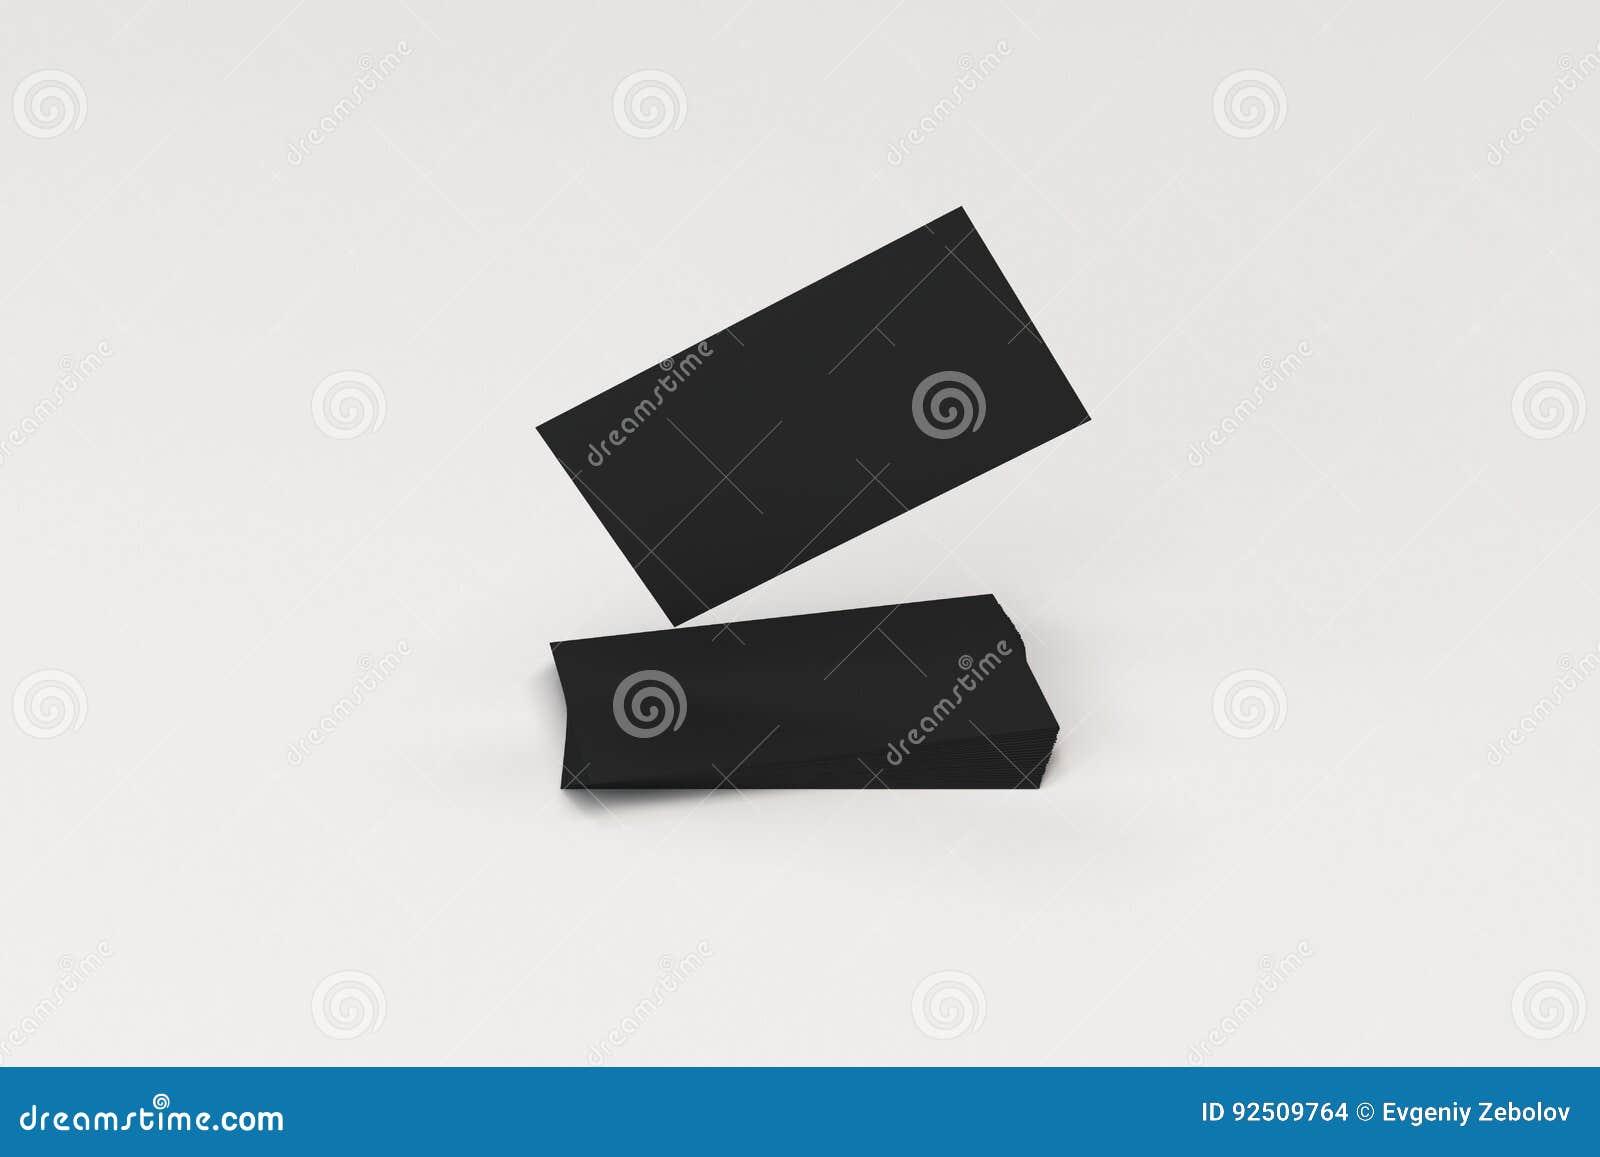 Black blank business cards mock up on white background stock download black blank business cards mock up on white background stock illustration illustration of colourmoves